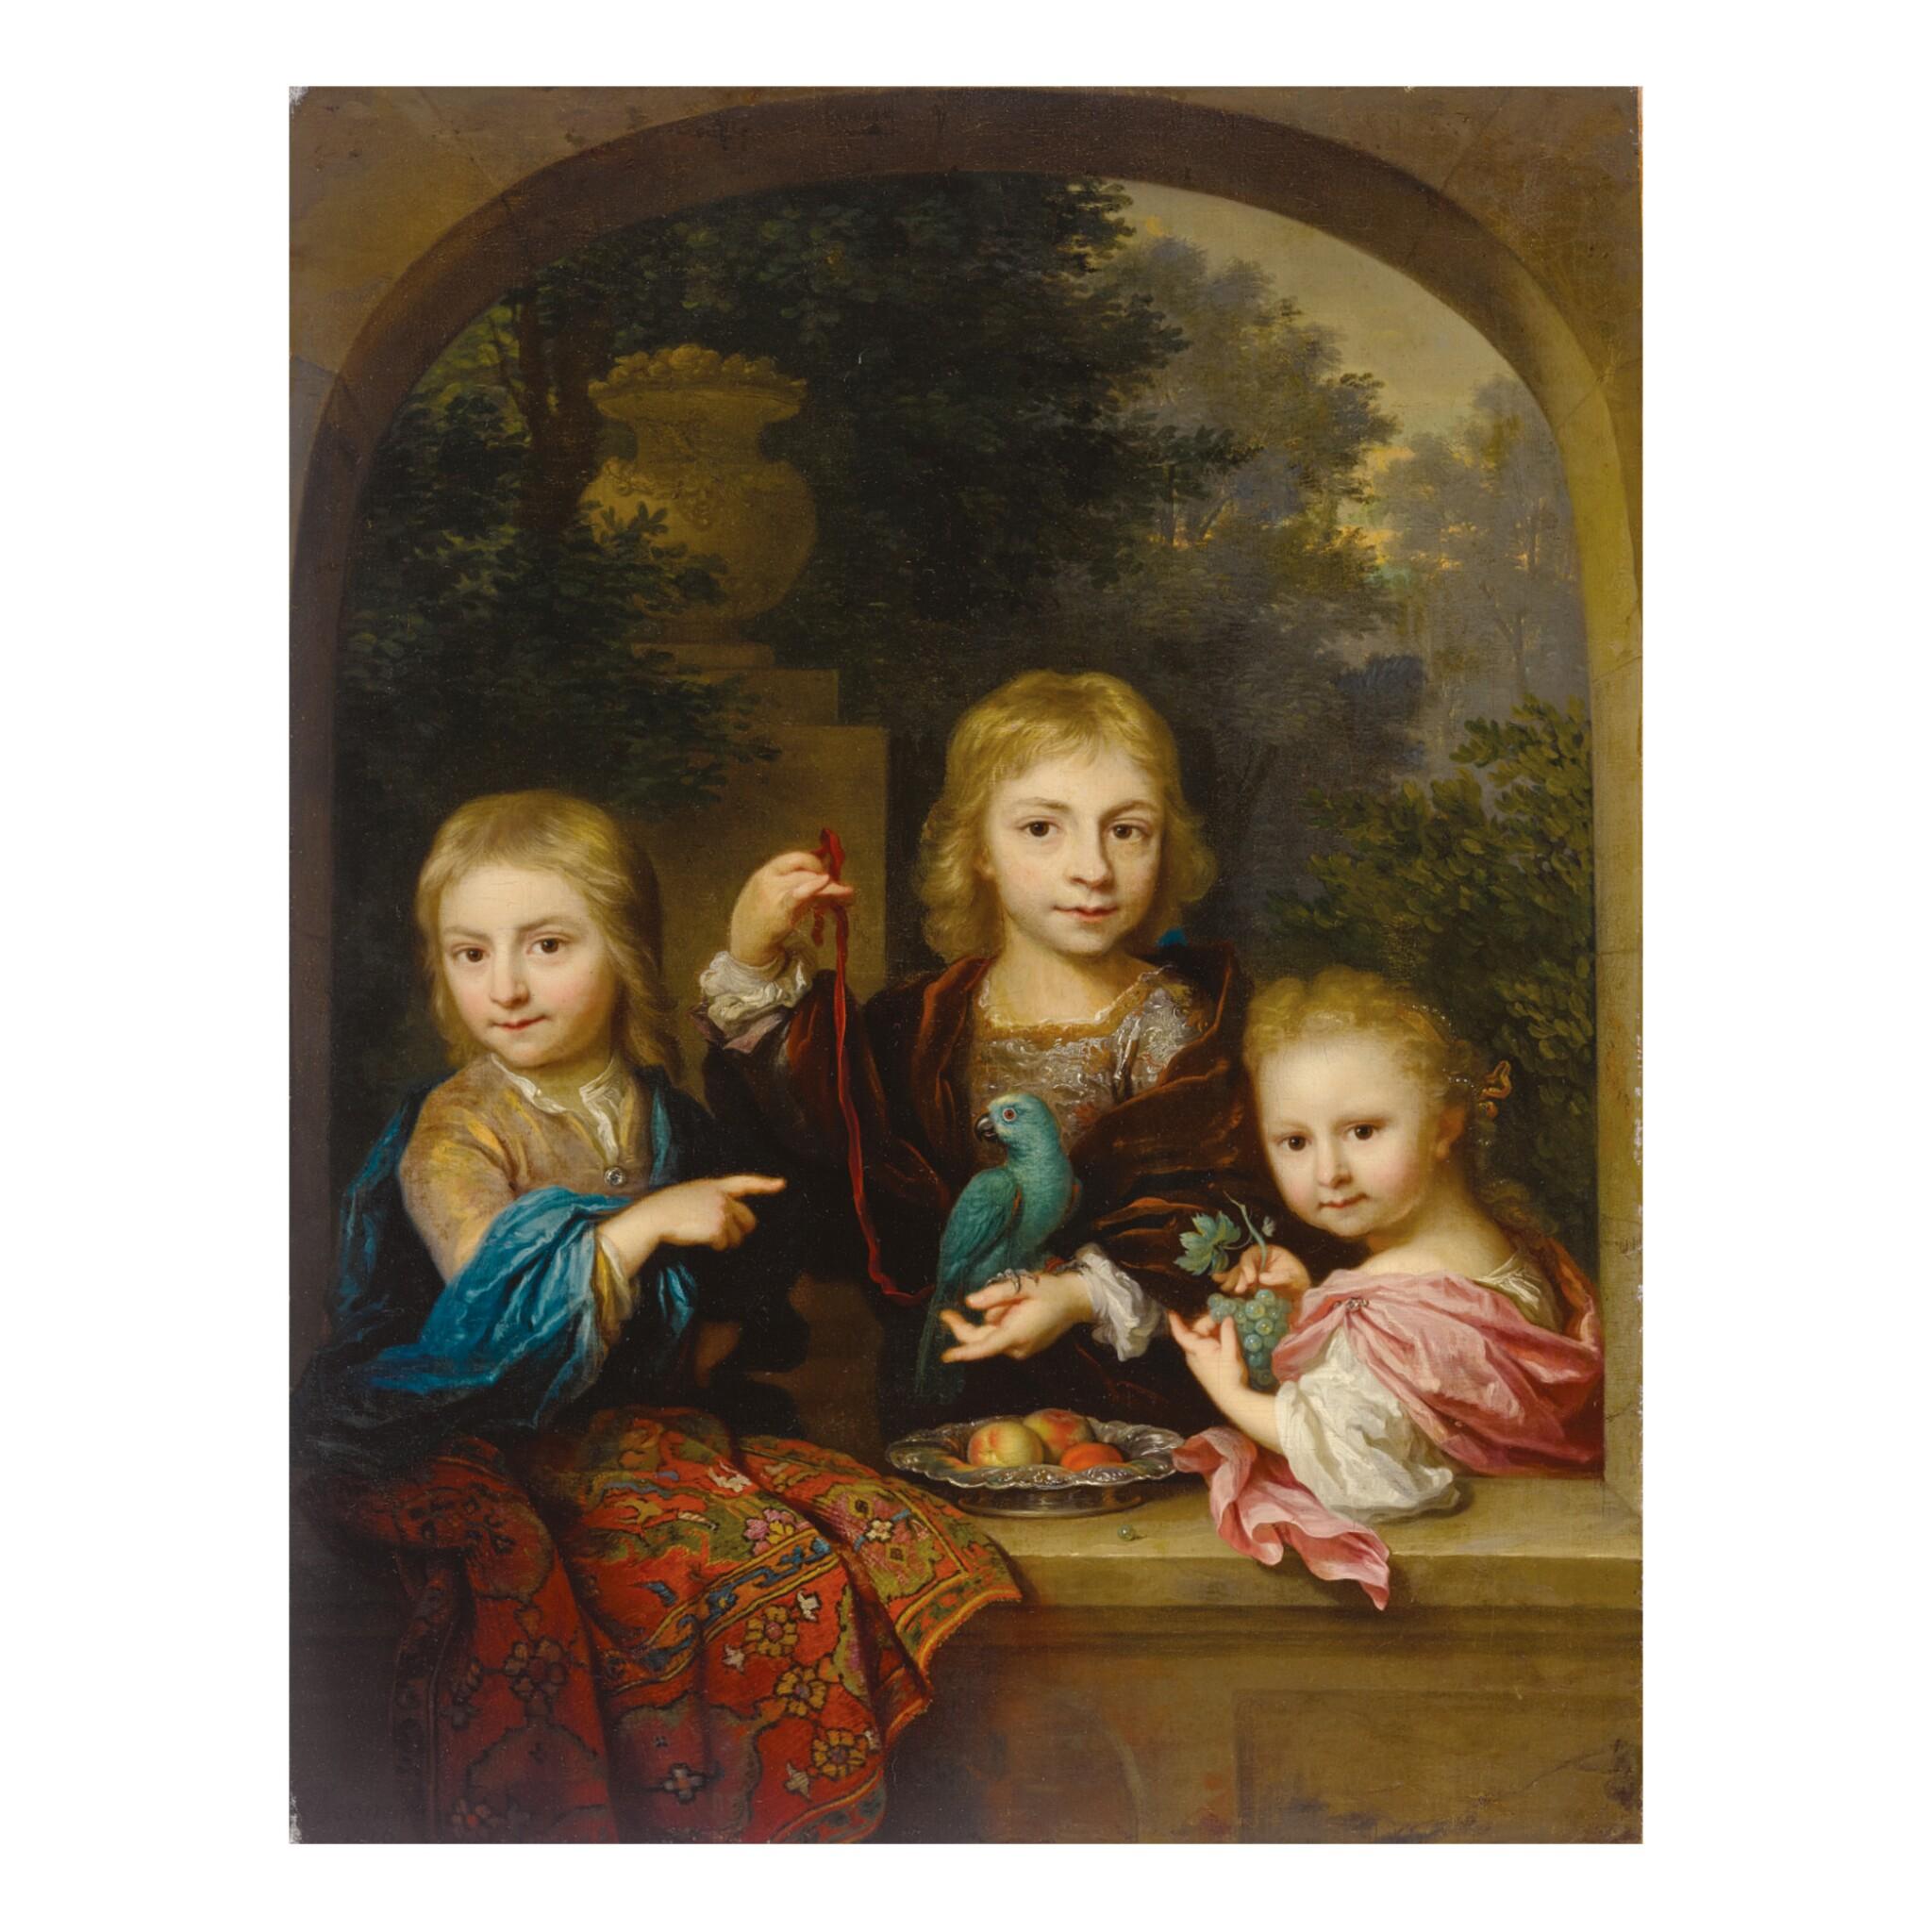 View full screen - View 1 of Lot 50. ARNOLD BOONEN | PORTRAIT OF THE GEELVINCK CHILDREN: NICOLAAS (1706-1764), CORNELIS (1705 - ?) AND CATHARINA JACOBA GEELVINCK (1710-1759).